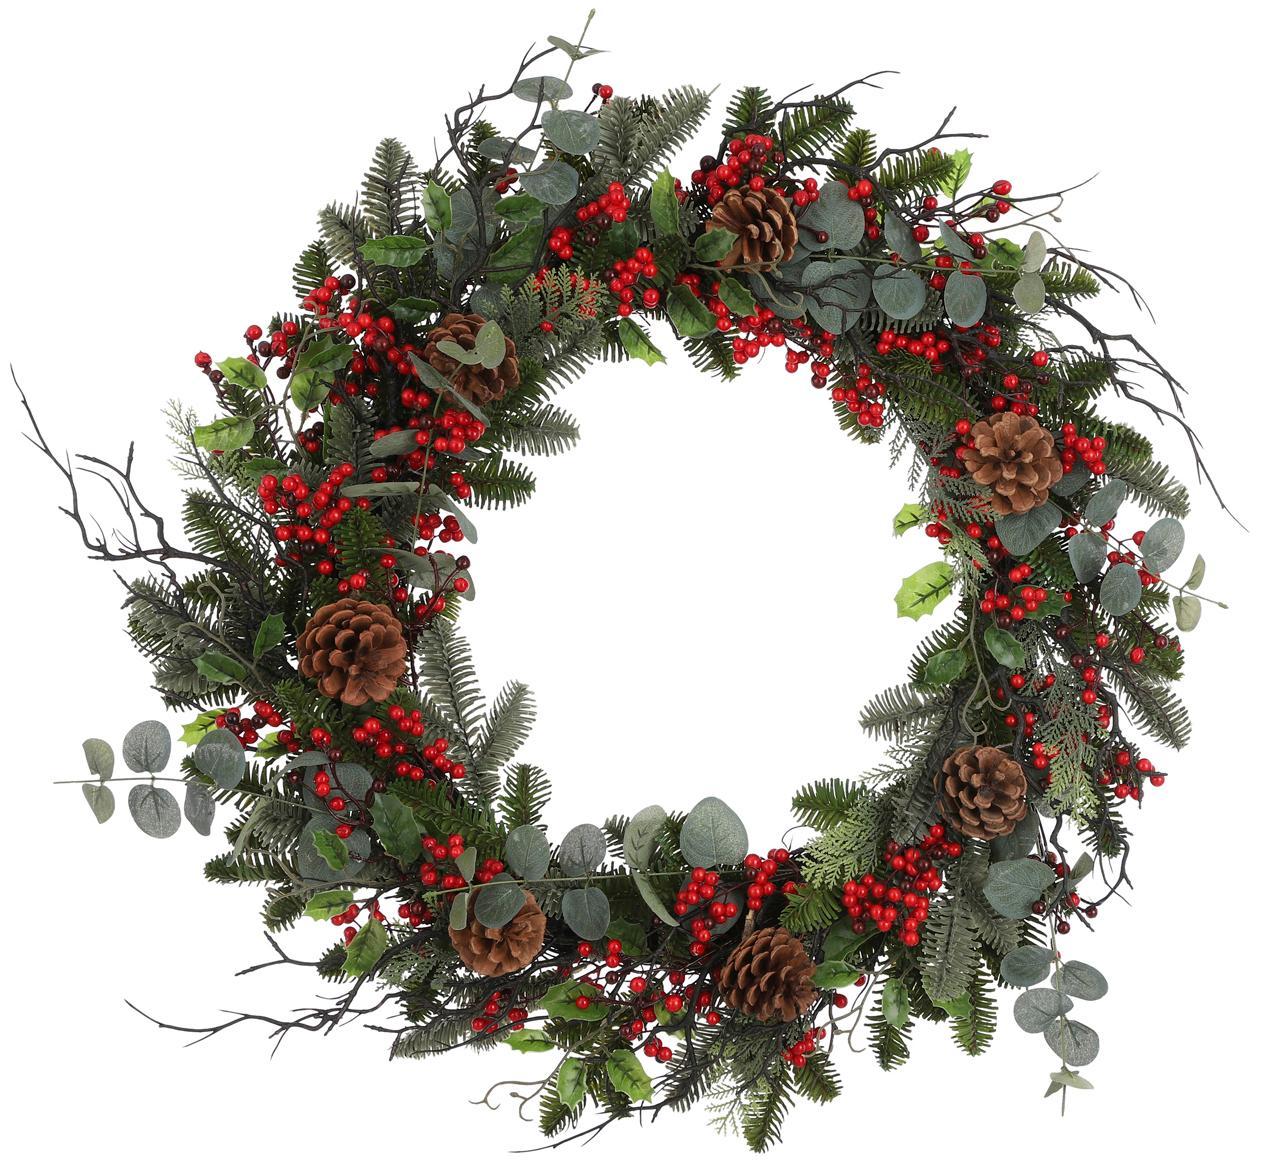 Ghirlanda natalizia artificiale Addy, Materiale sintetico (PVC), Verde, rosso, Ø 70 x Alt. 10 cm